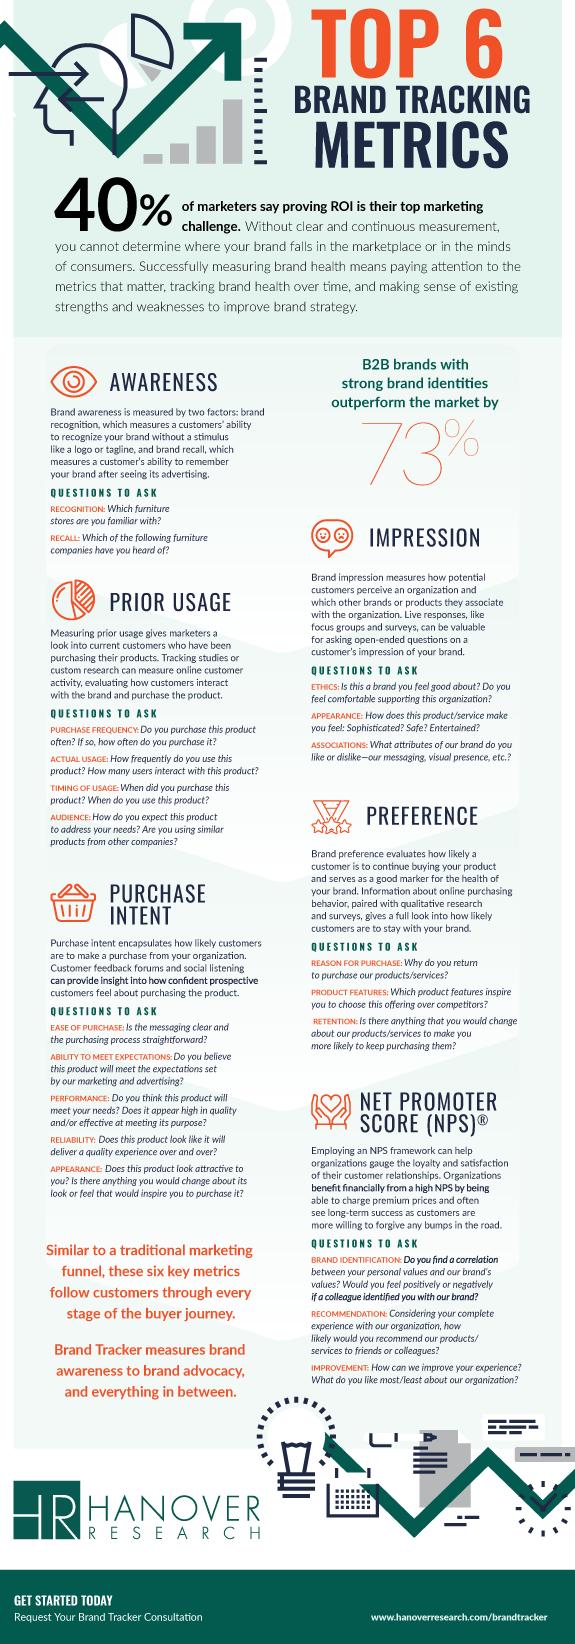 Top 6 Brand Tracking Metrics